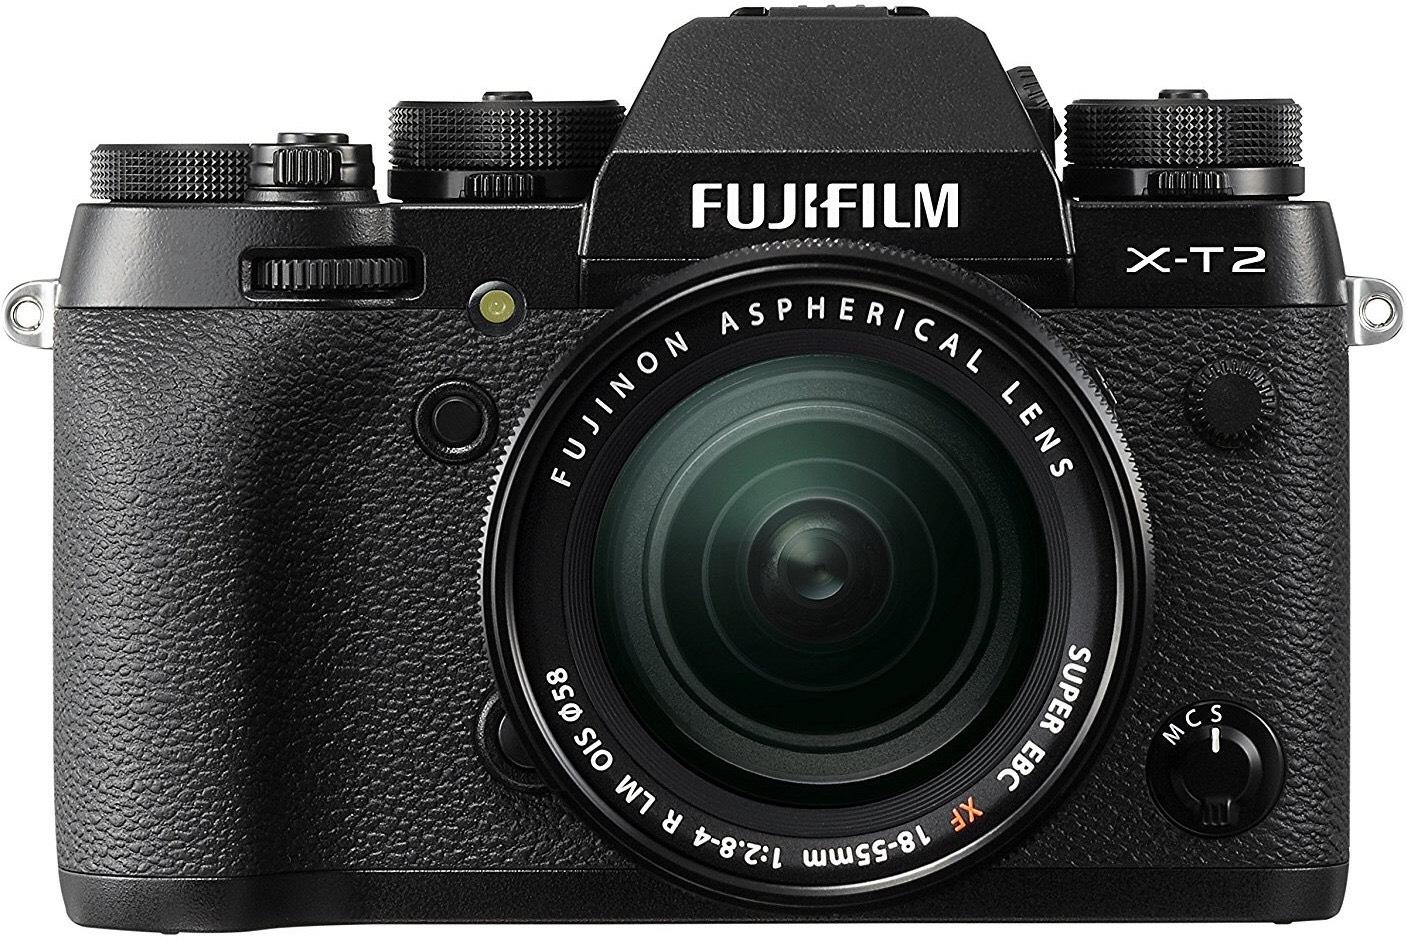 Fujifilm X-T2 Systemkamera inkl. Fujinon XF18-55F2,8-4 Objektiv